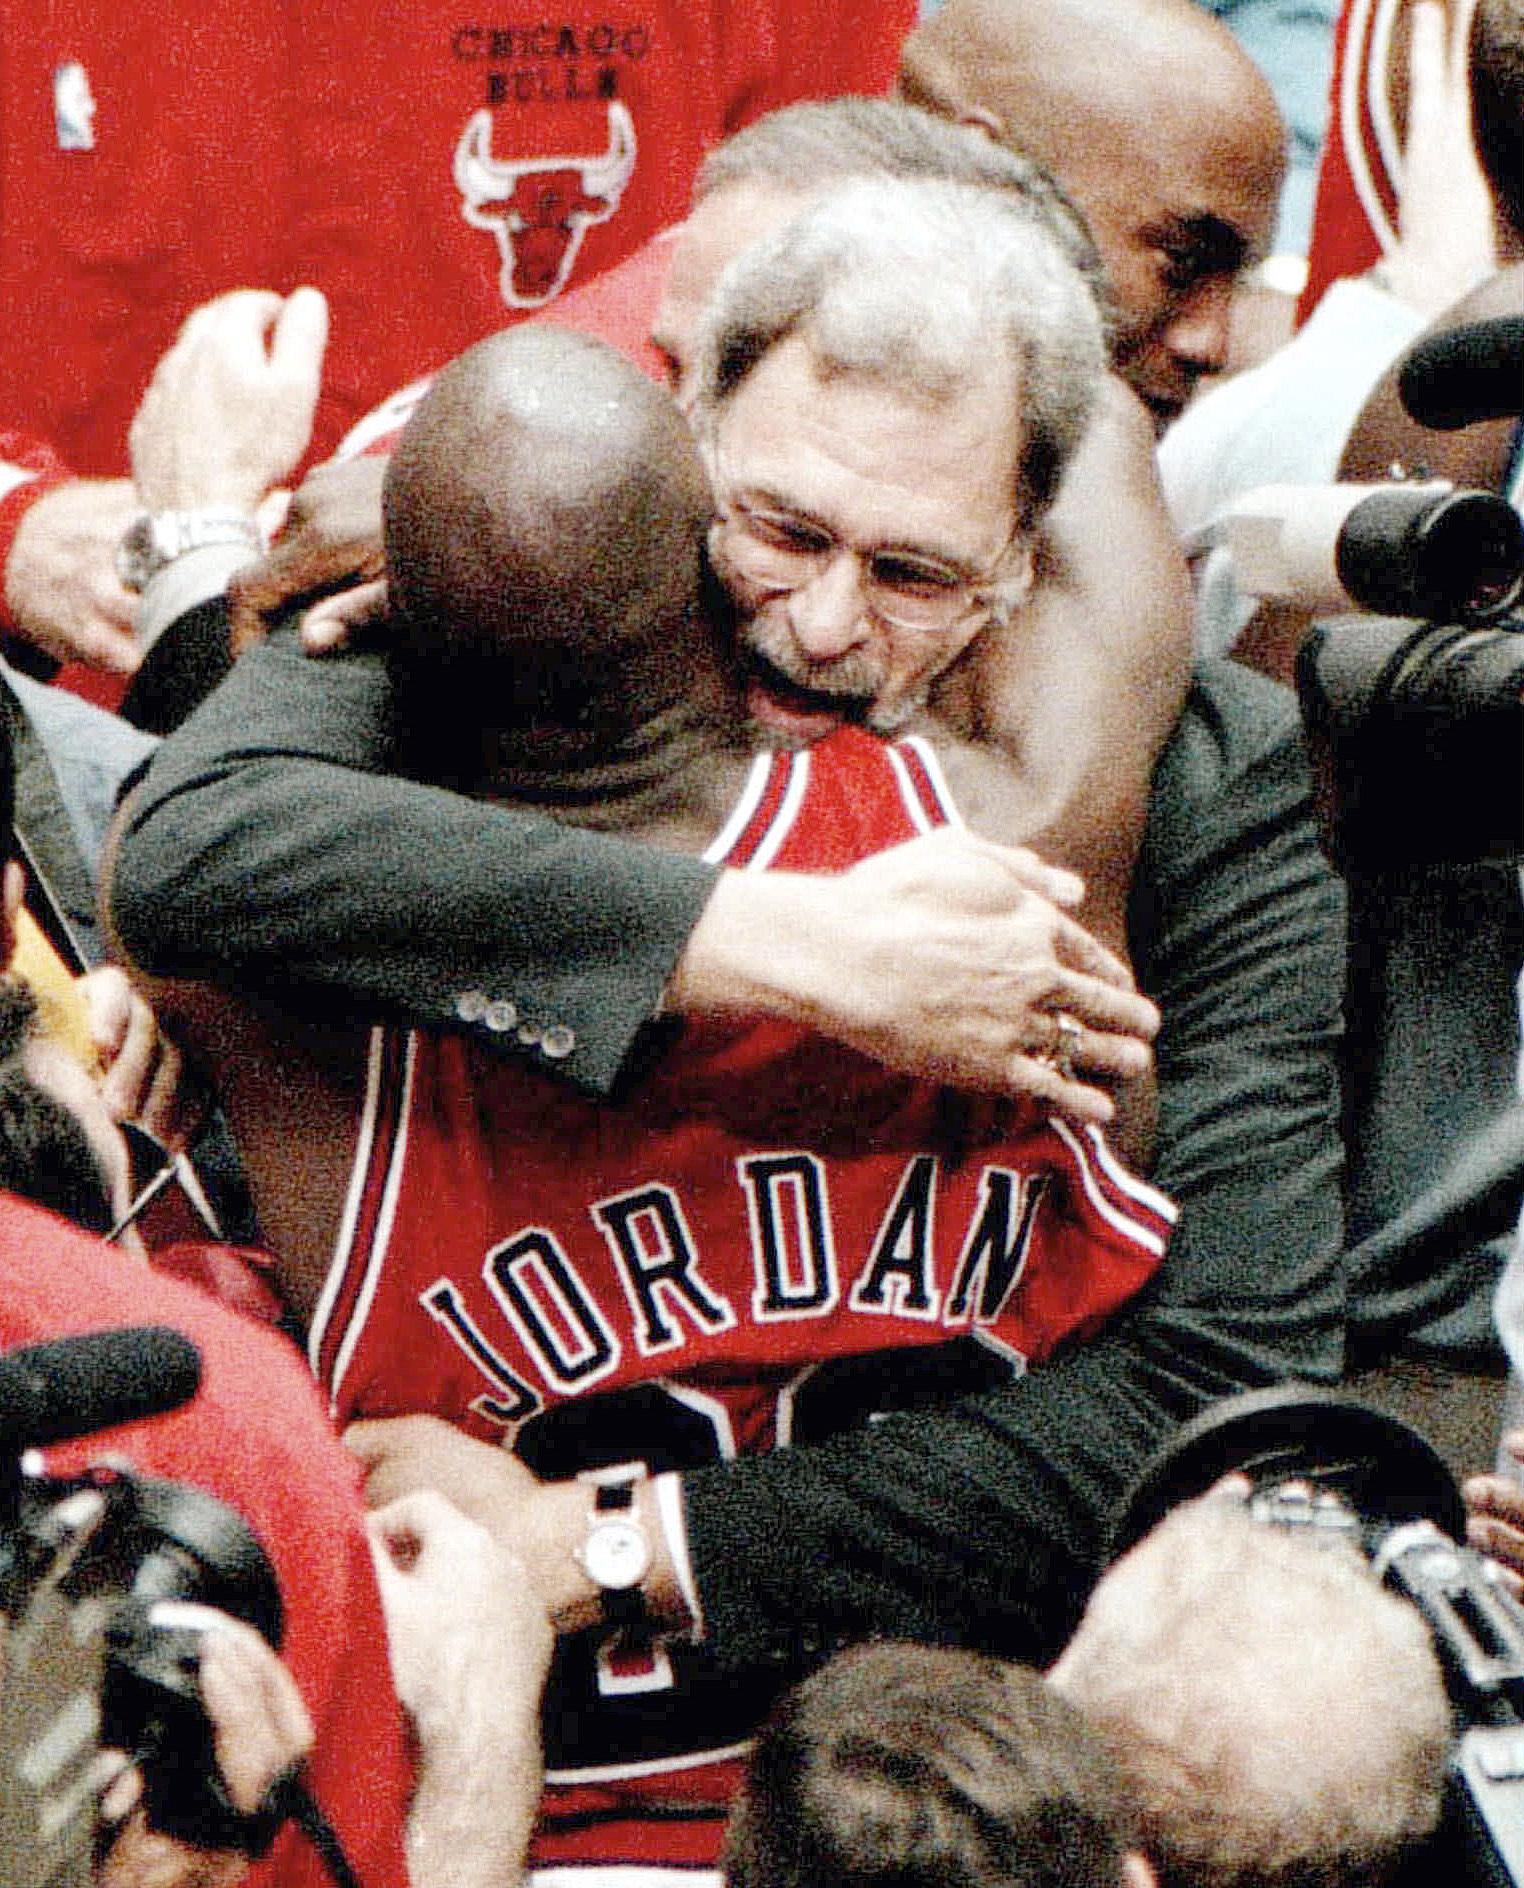 Phil Jackson and Michael Jordan embrace after the Bulls won their sixth NBA championship.